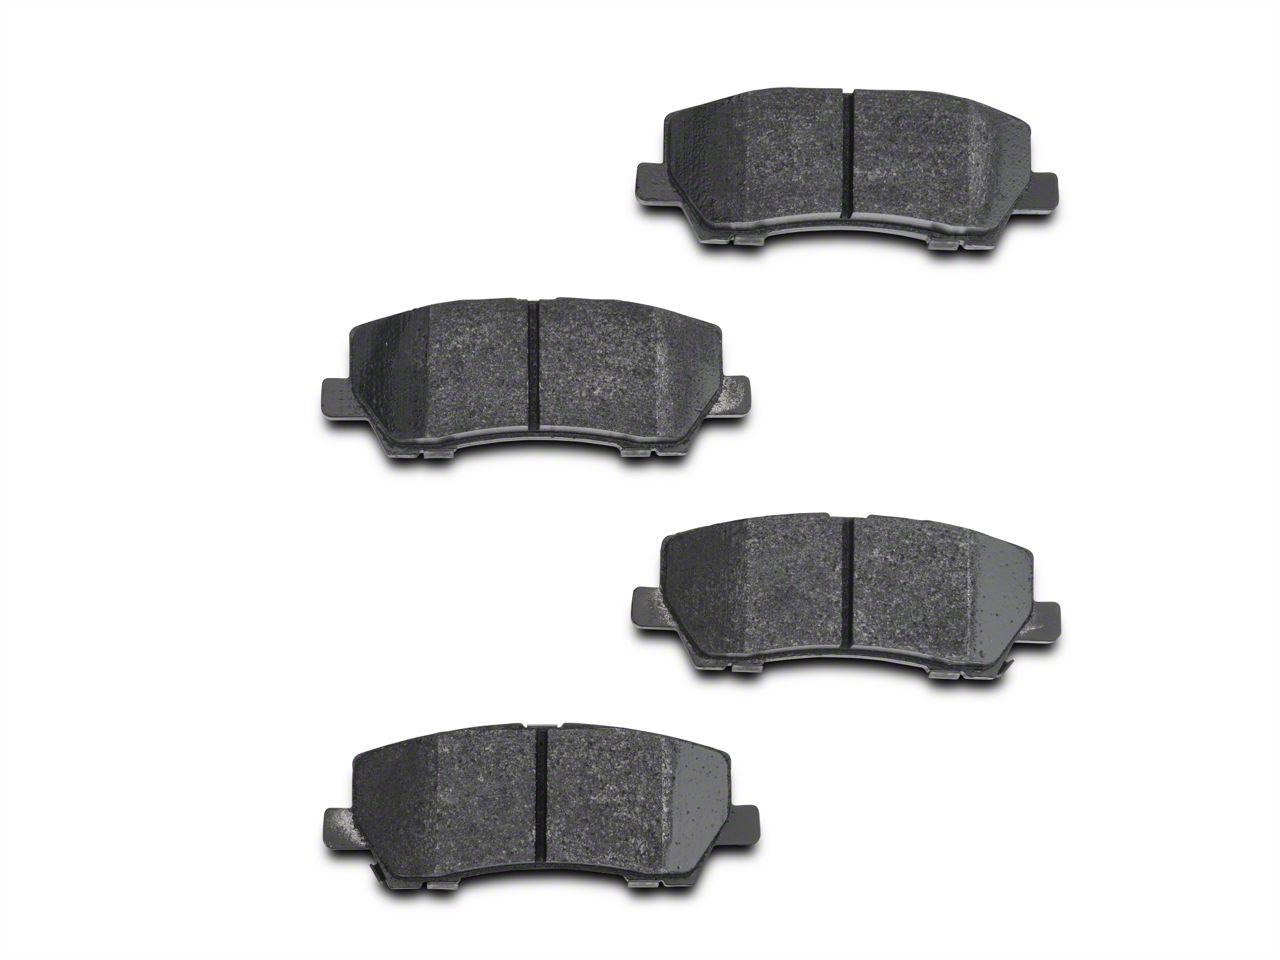 Hawk Performance Ceramic Brake Pads - Rear Pair (15-19 GT, EcoBoost, V6)